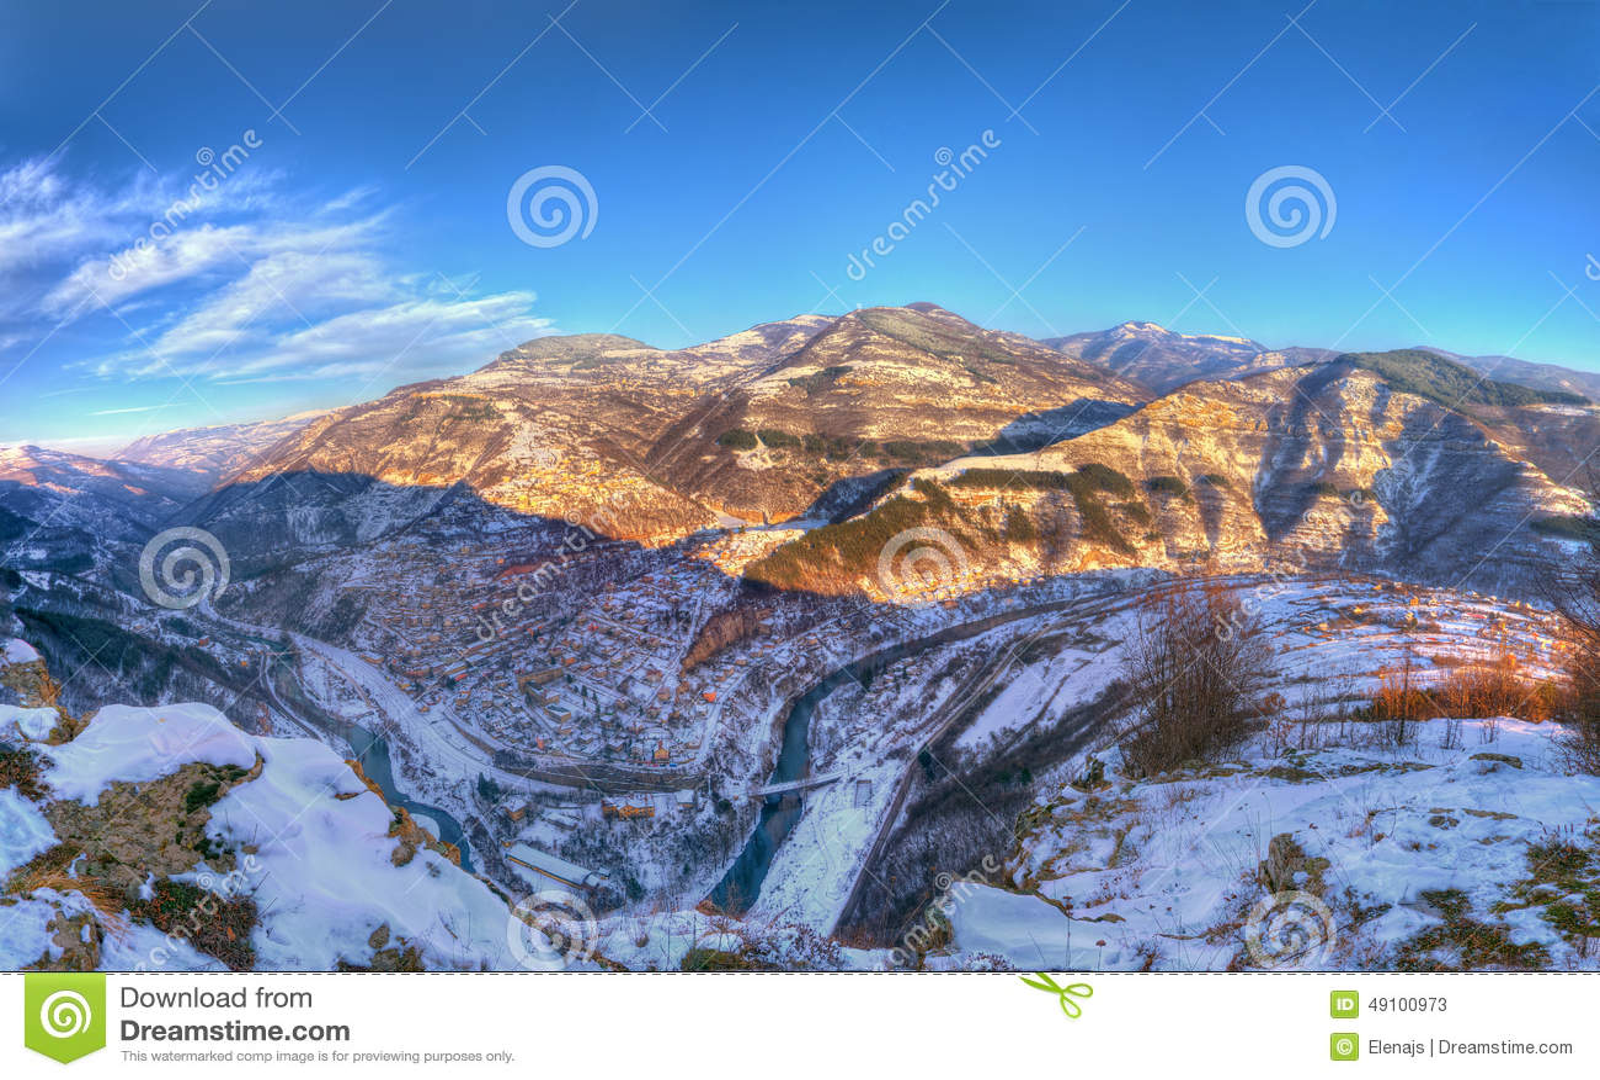 Iskar wąwóz i Bov, Bułgaria